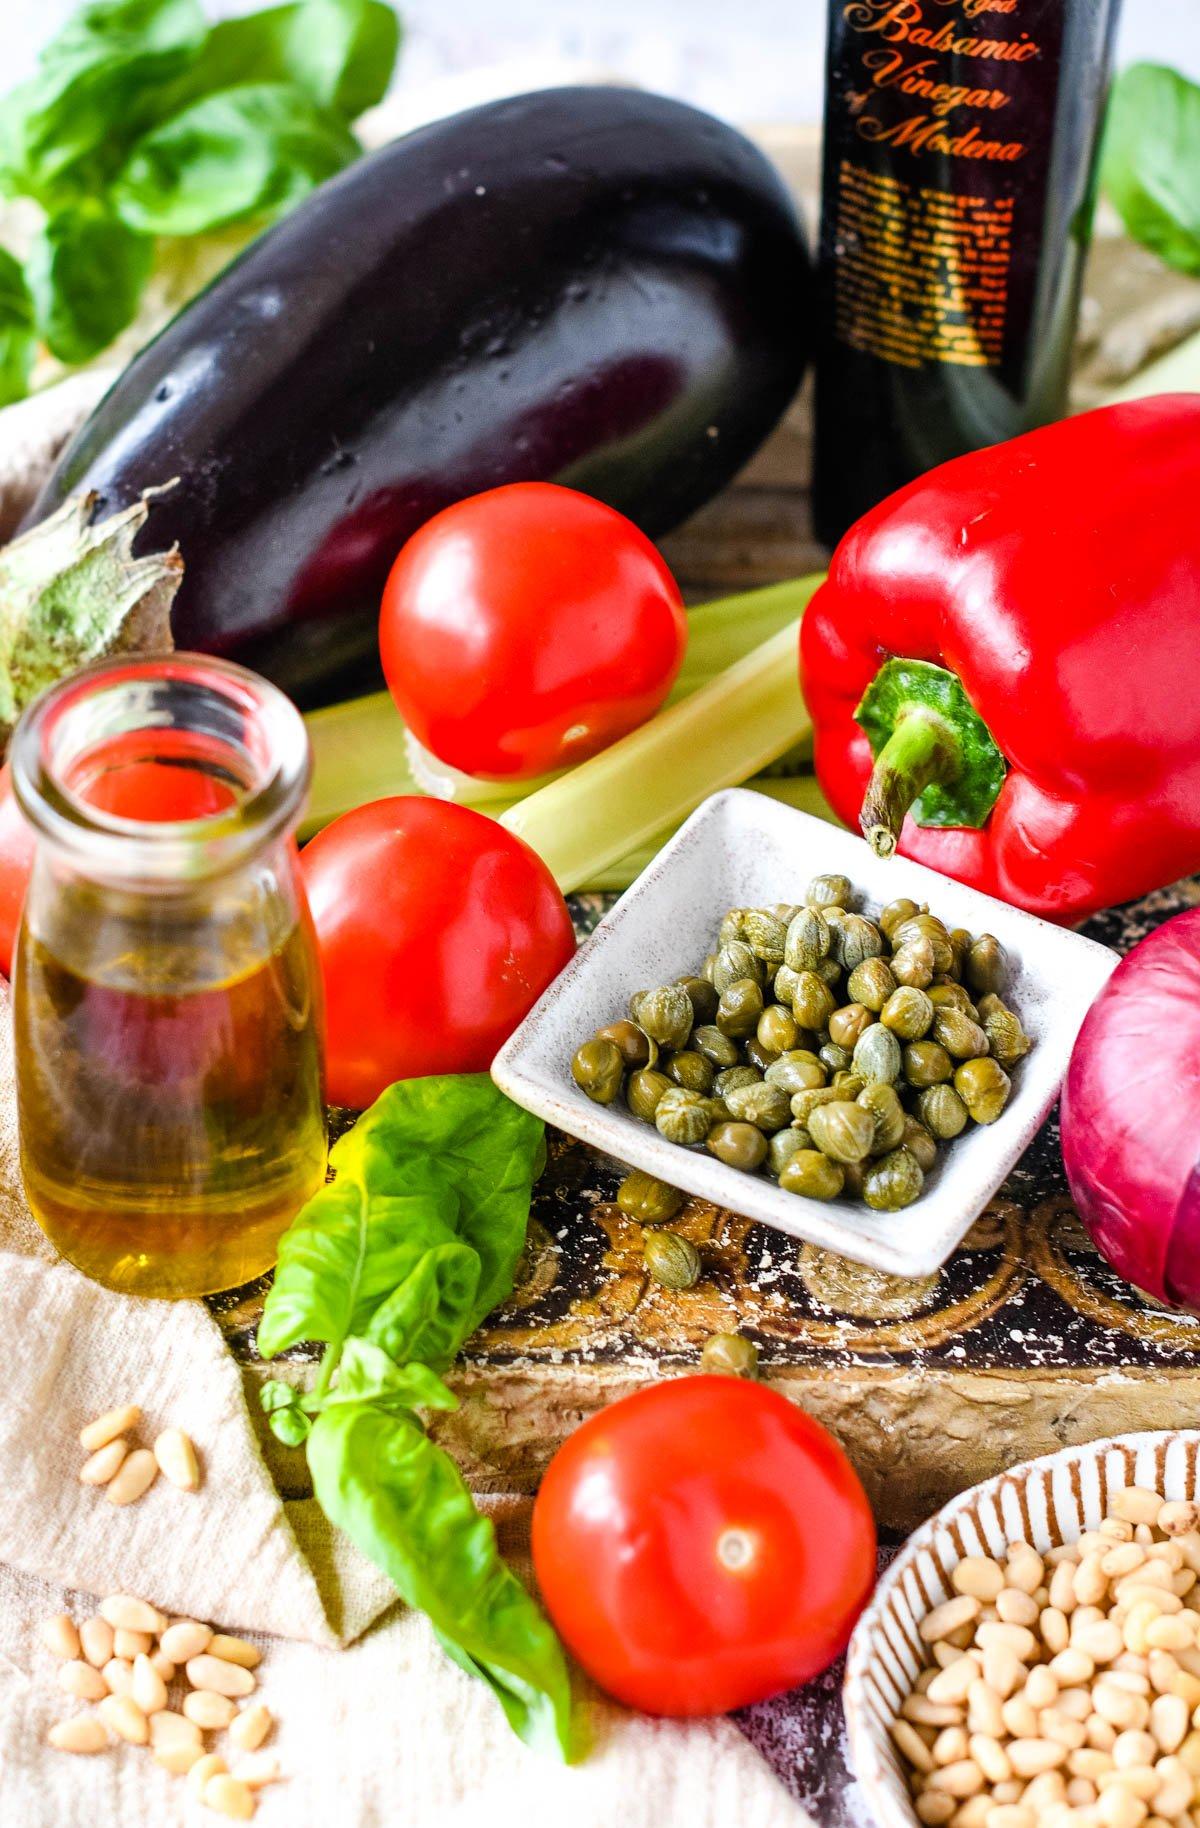 ingredients for caponata